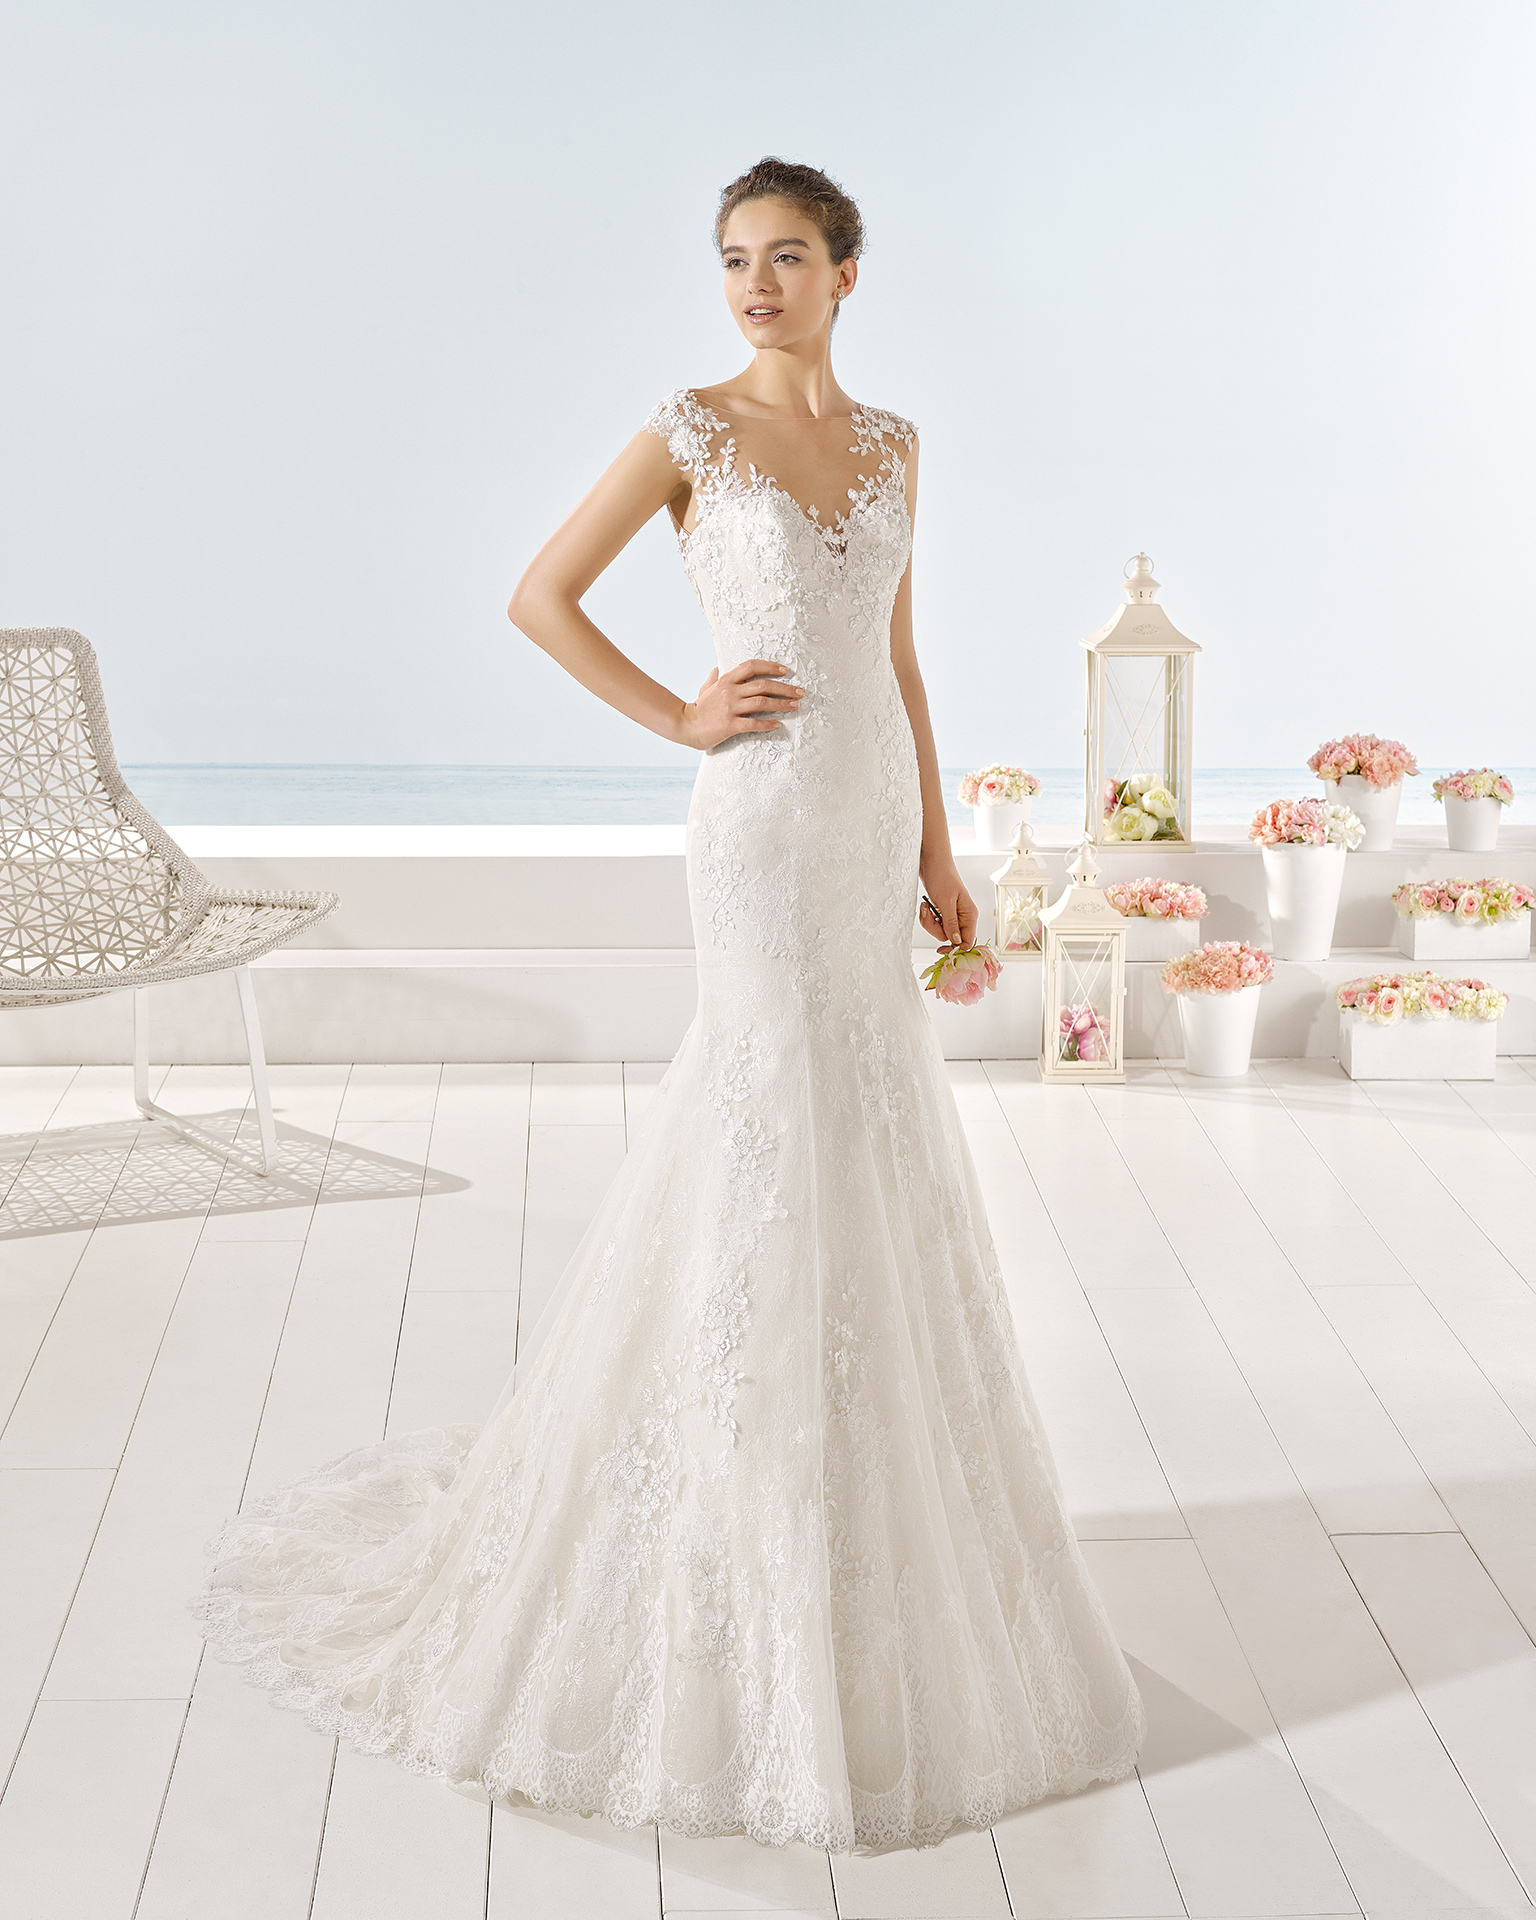 Yana wedding dress, Luna Novias 2017